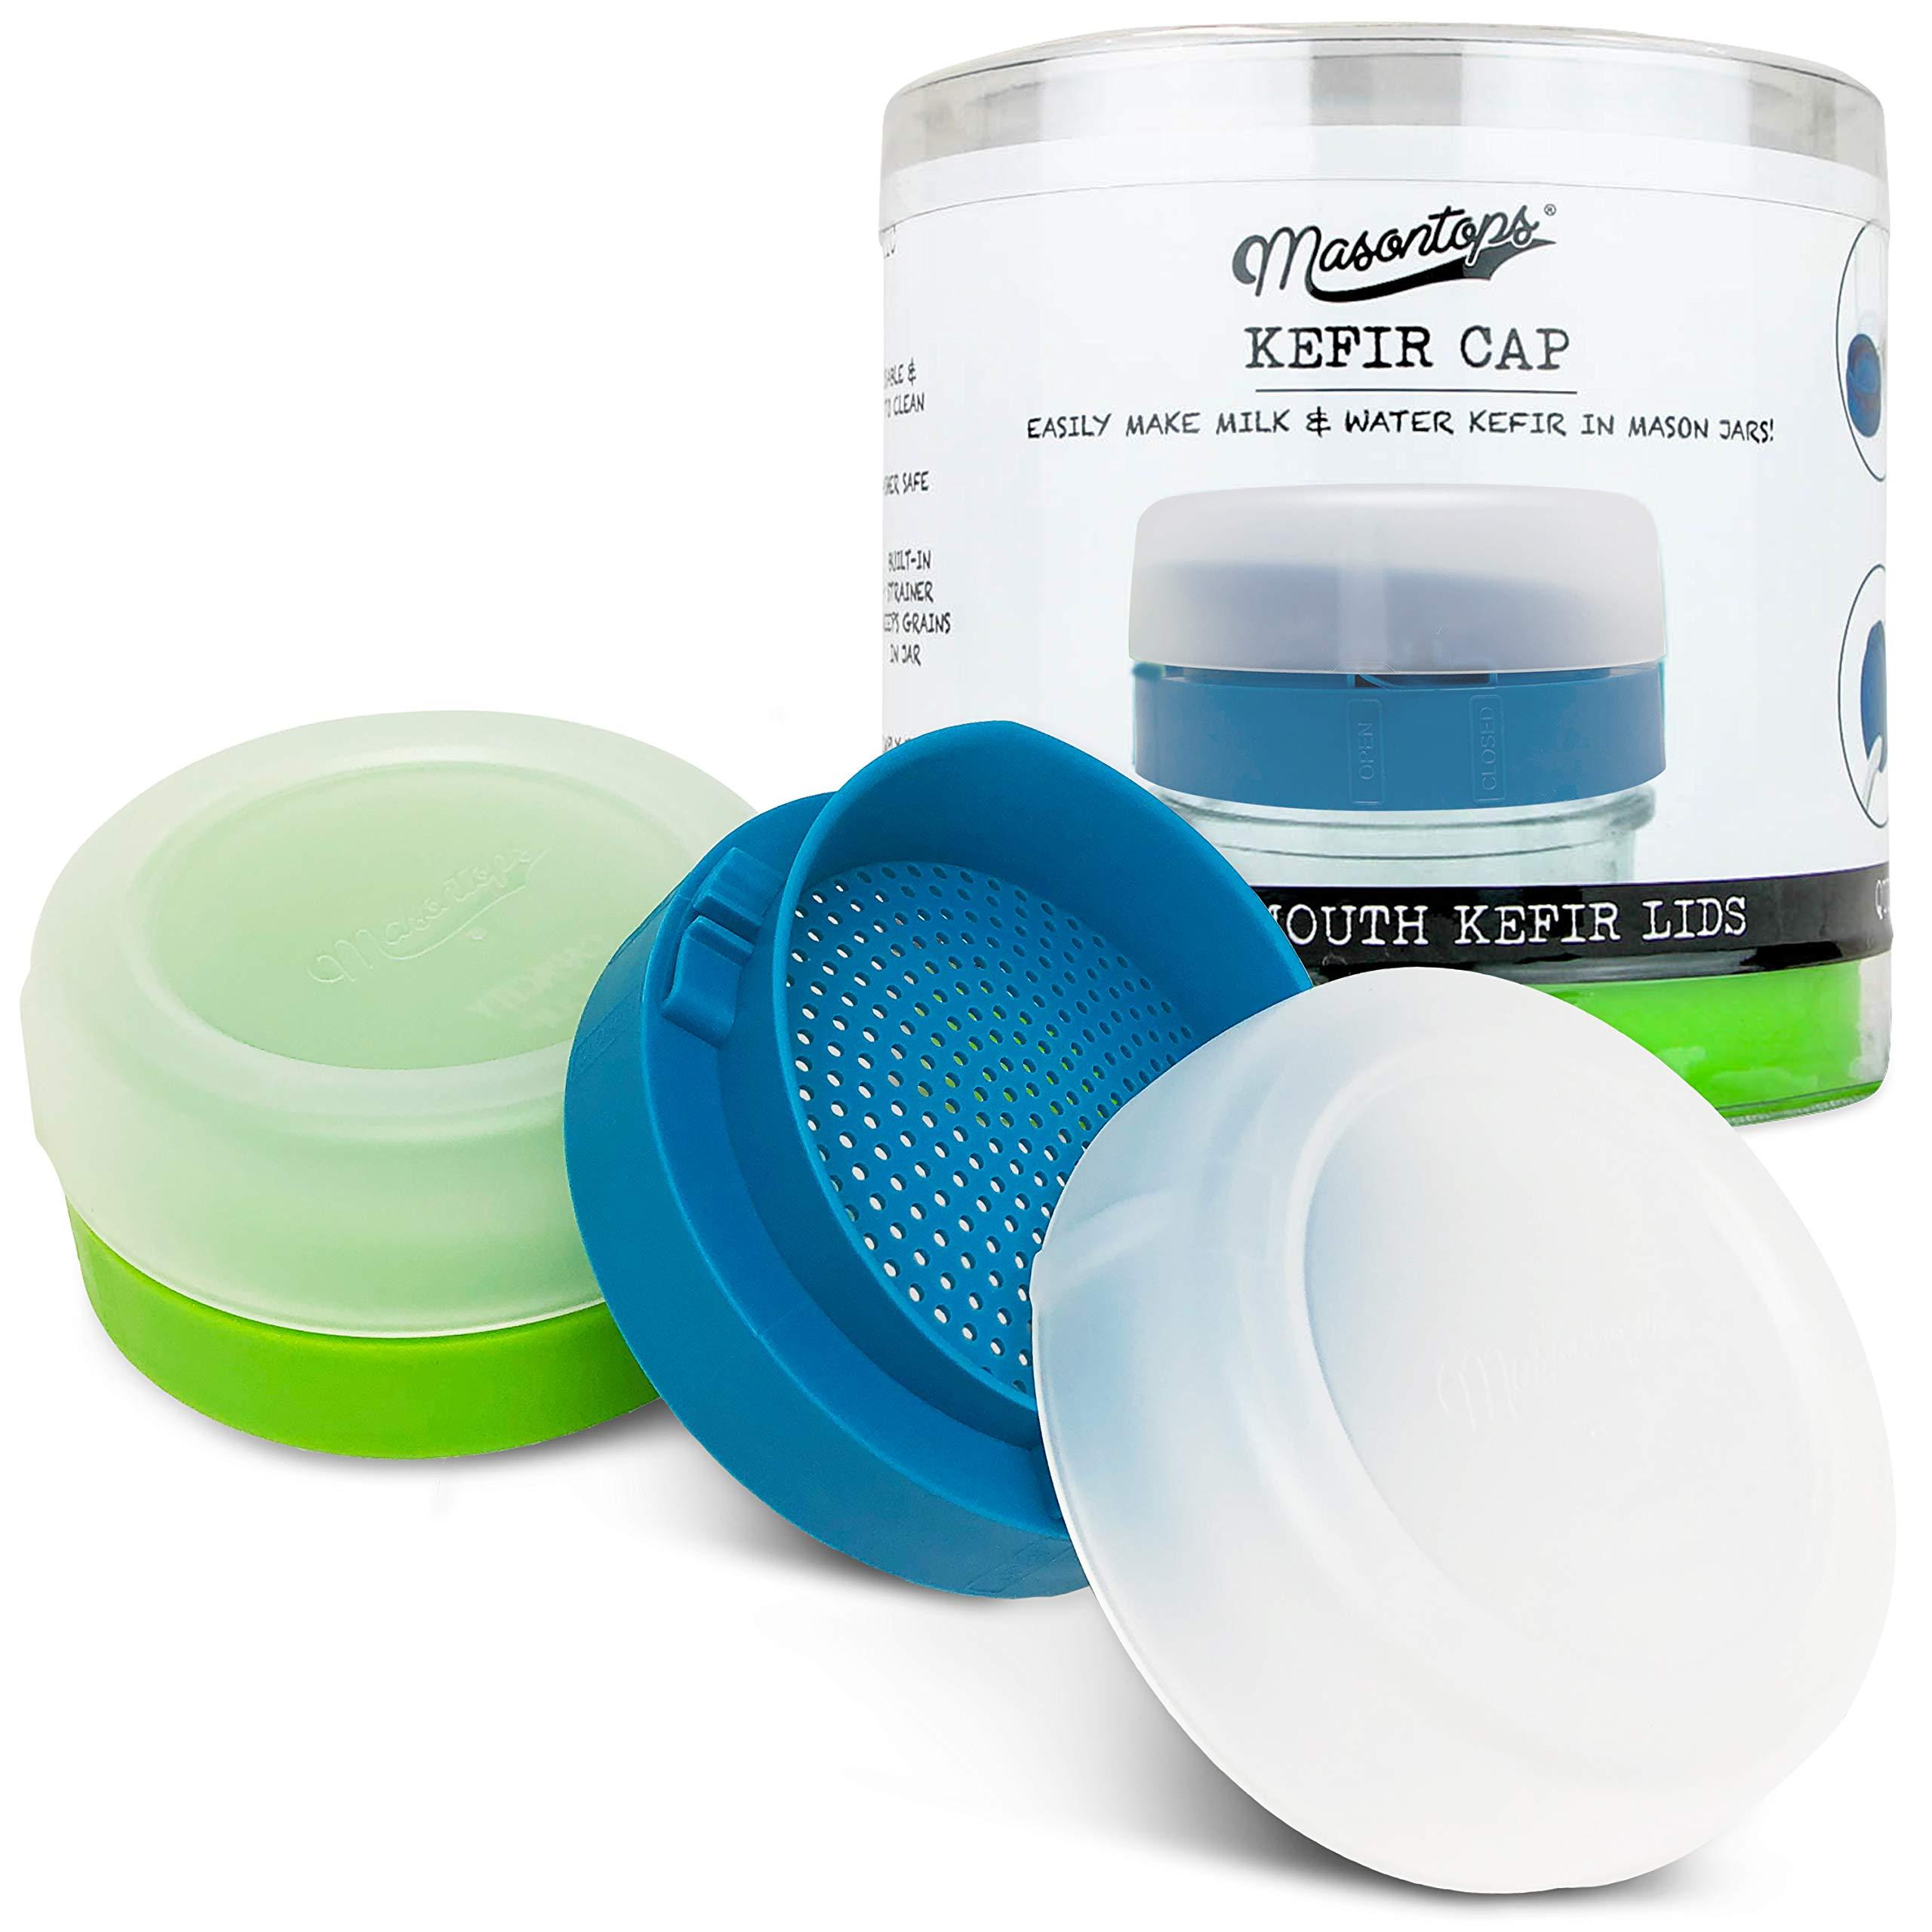 Masontops Kefir Caps - Wide Mouth Mason Jar Lids - Live Culture Grains Strainer - Home Fermentation Starter Kit - 2 Pack by Masontops